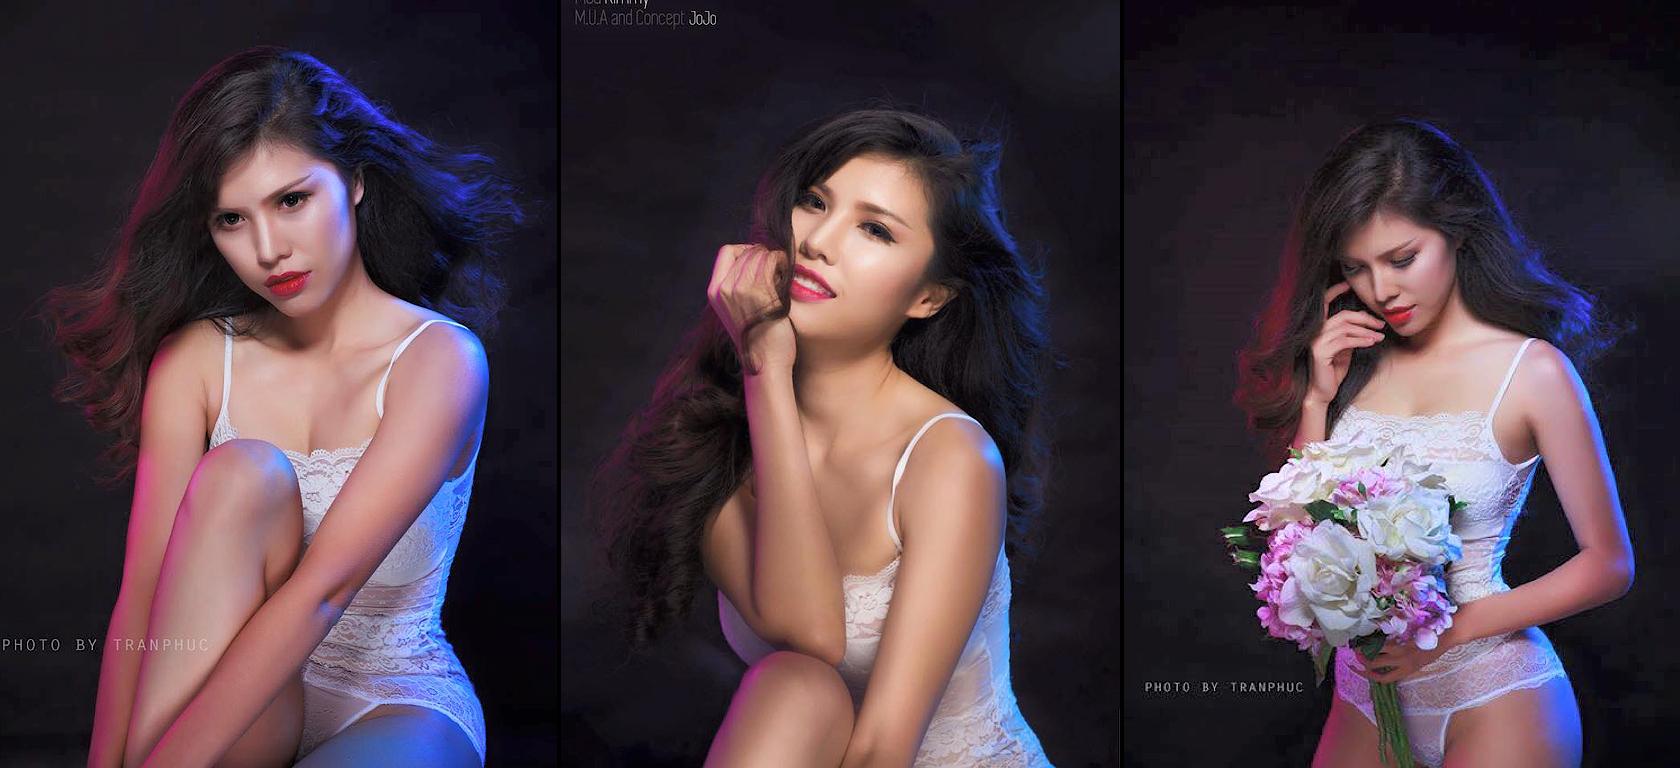 pg-nguoi-mau-model-bui-kim-my (1)